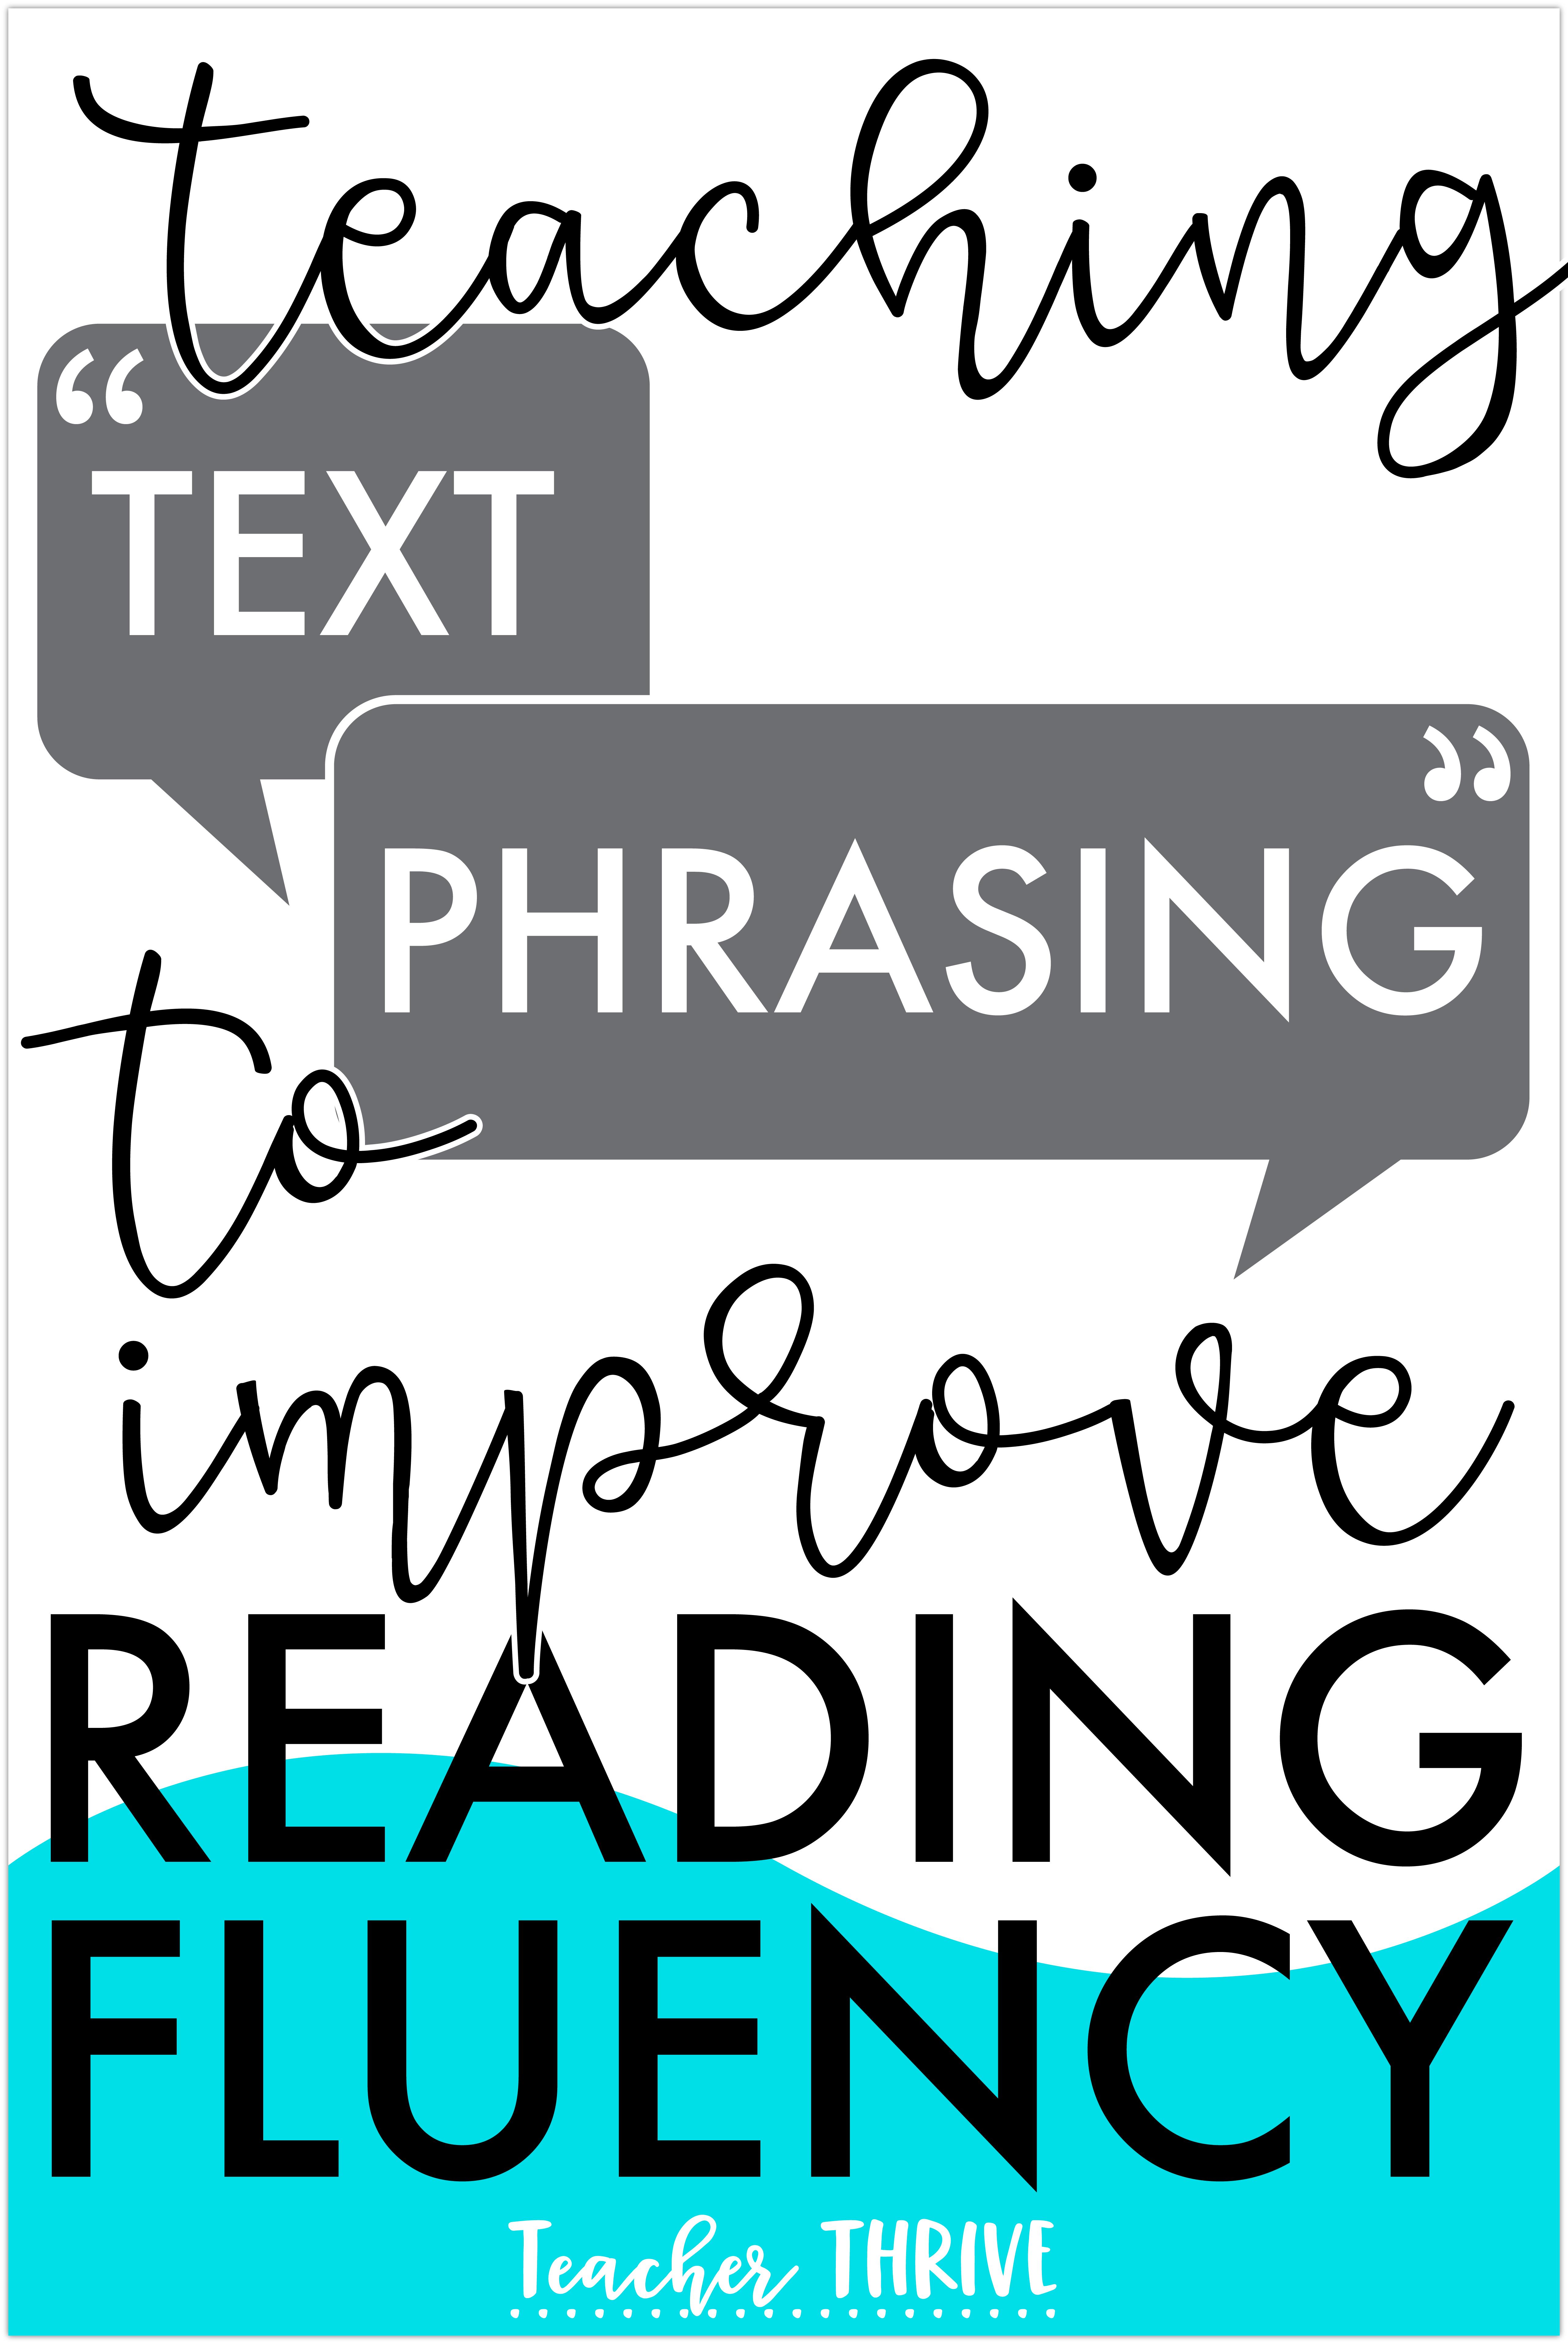 Text Phrasing And Reading Fluency Teacher Thrive Reading Fluency Reading Mini Lessons Guided Reading Lessons Kindergarten [ 7666 x 5129 Pixel ]